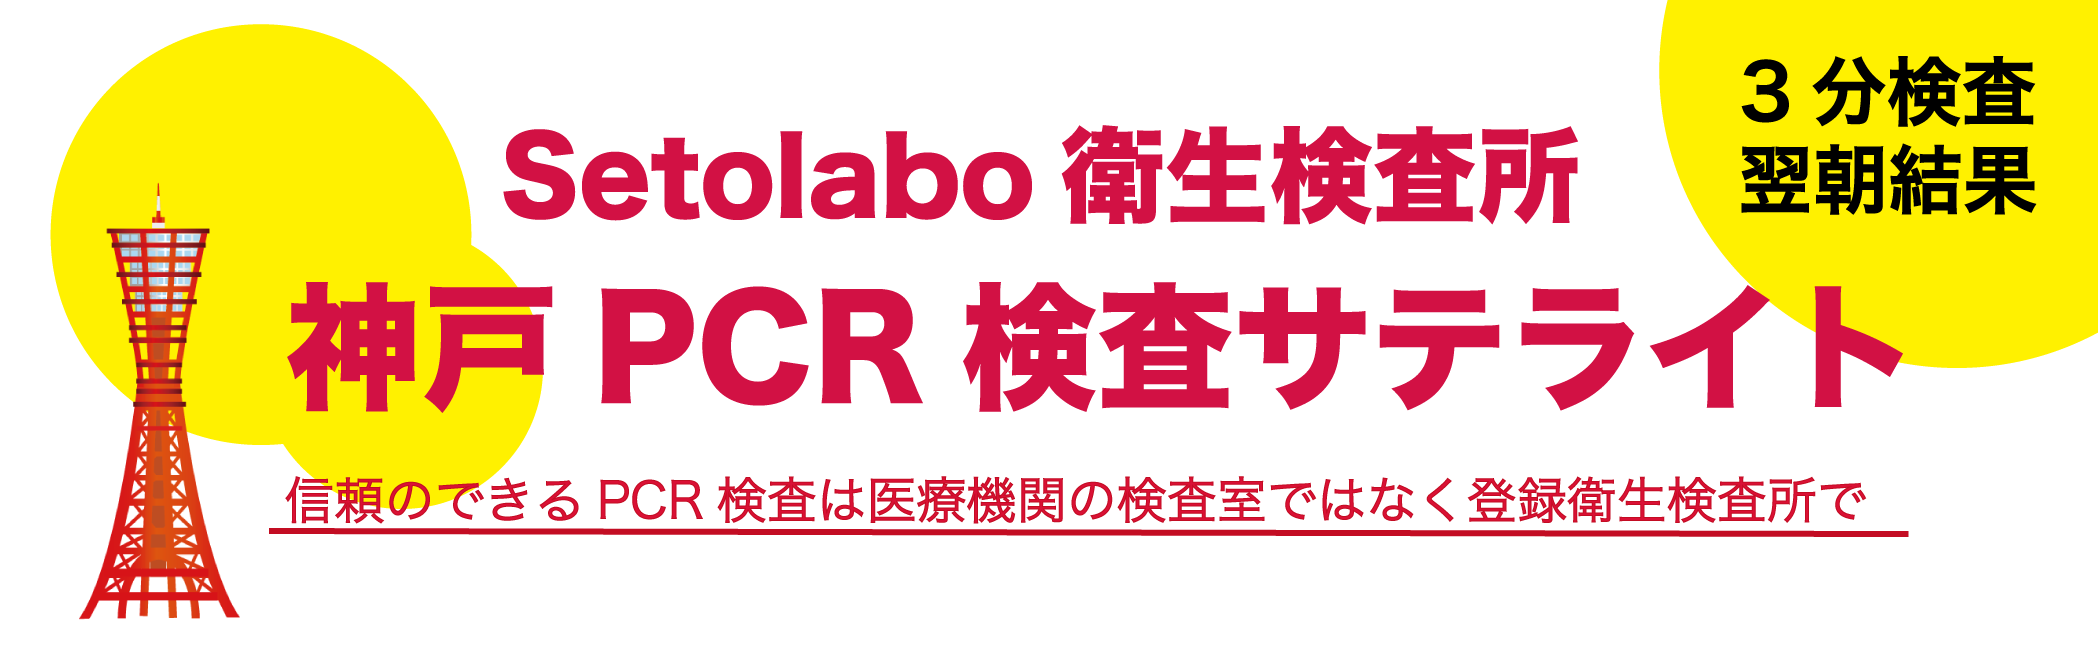 Pcr 検査 民間